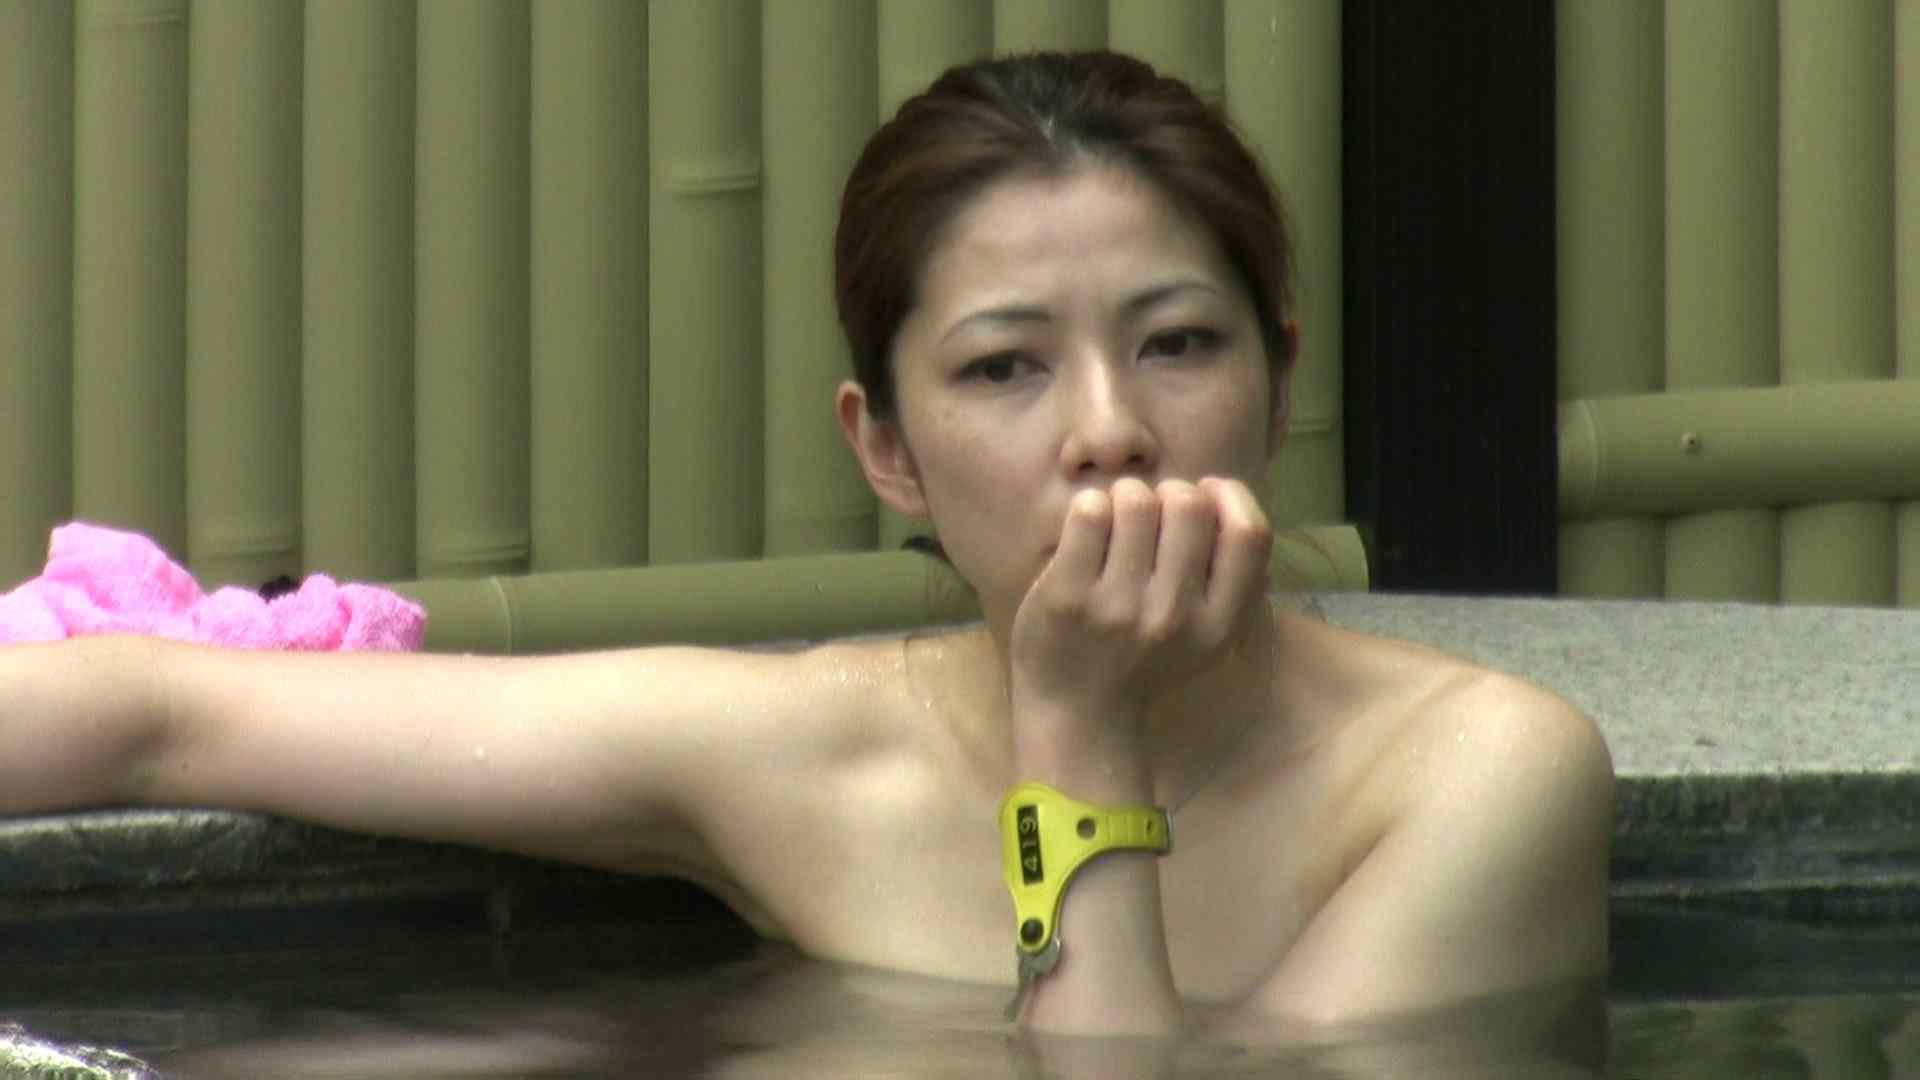 Aquaな露天風呂Vol.660 露天  59連発 36